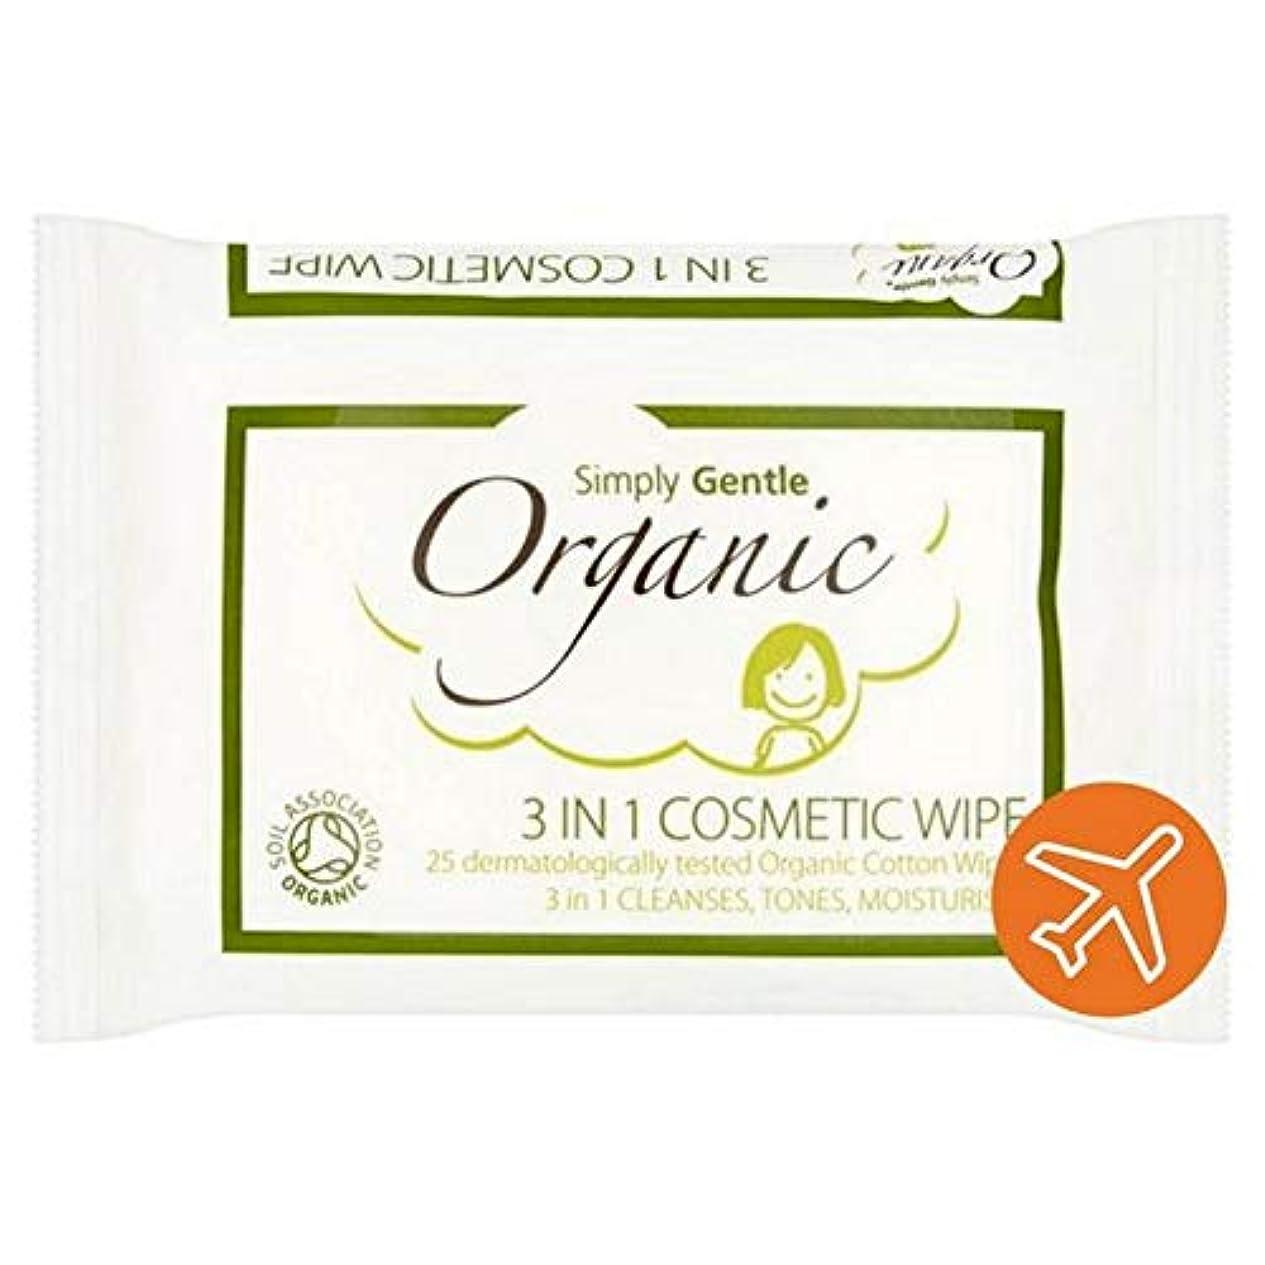 [Simply Gentle ] 単に優しい有機顔パックごとに25を拭きます - Simply Gentle Organic Face Wipe 25 per pack [並行輸入品]